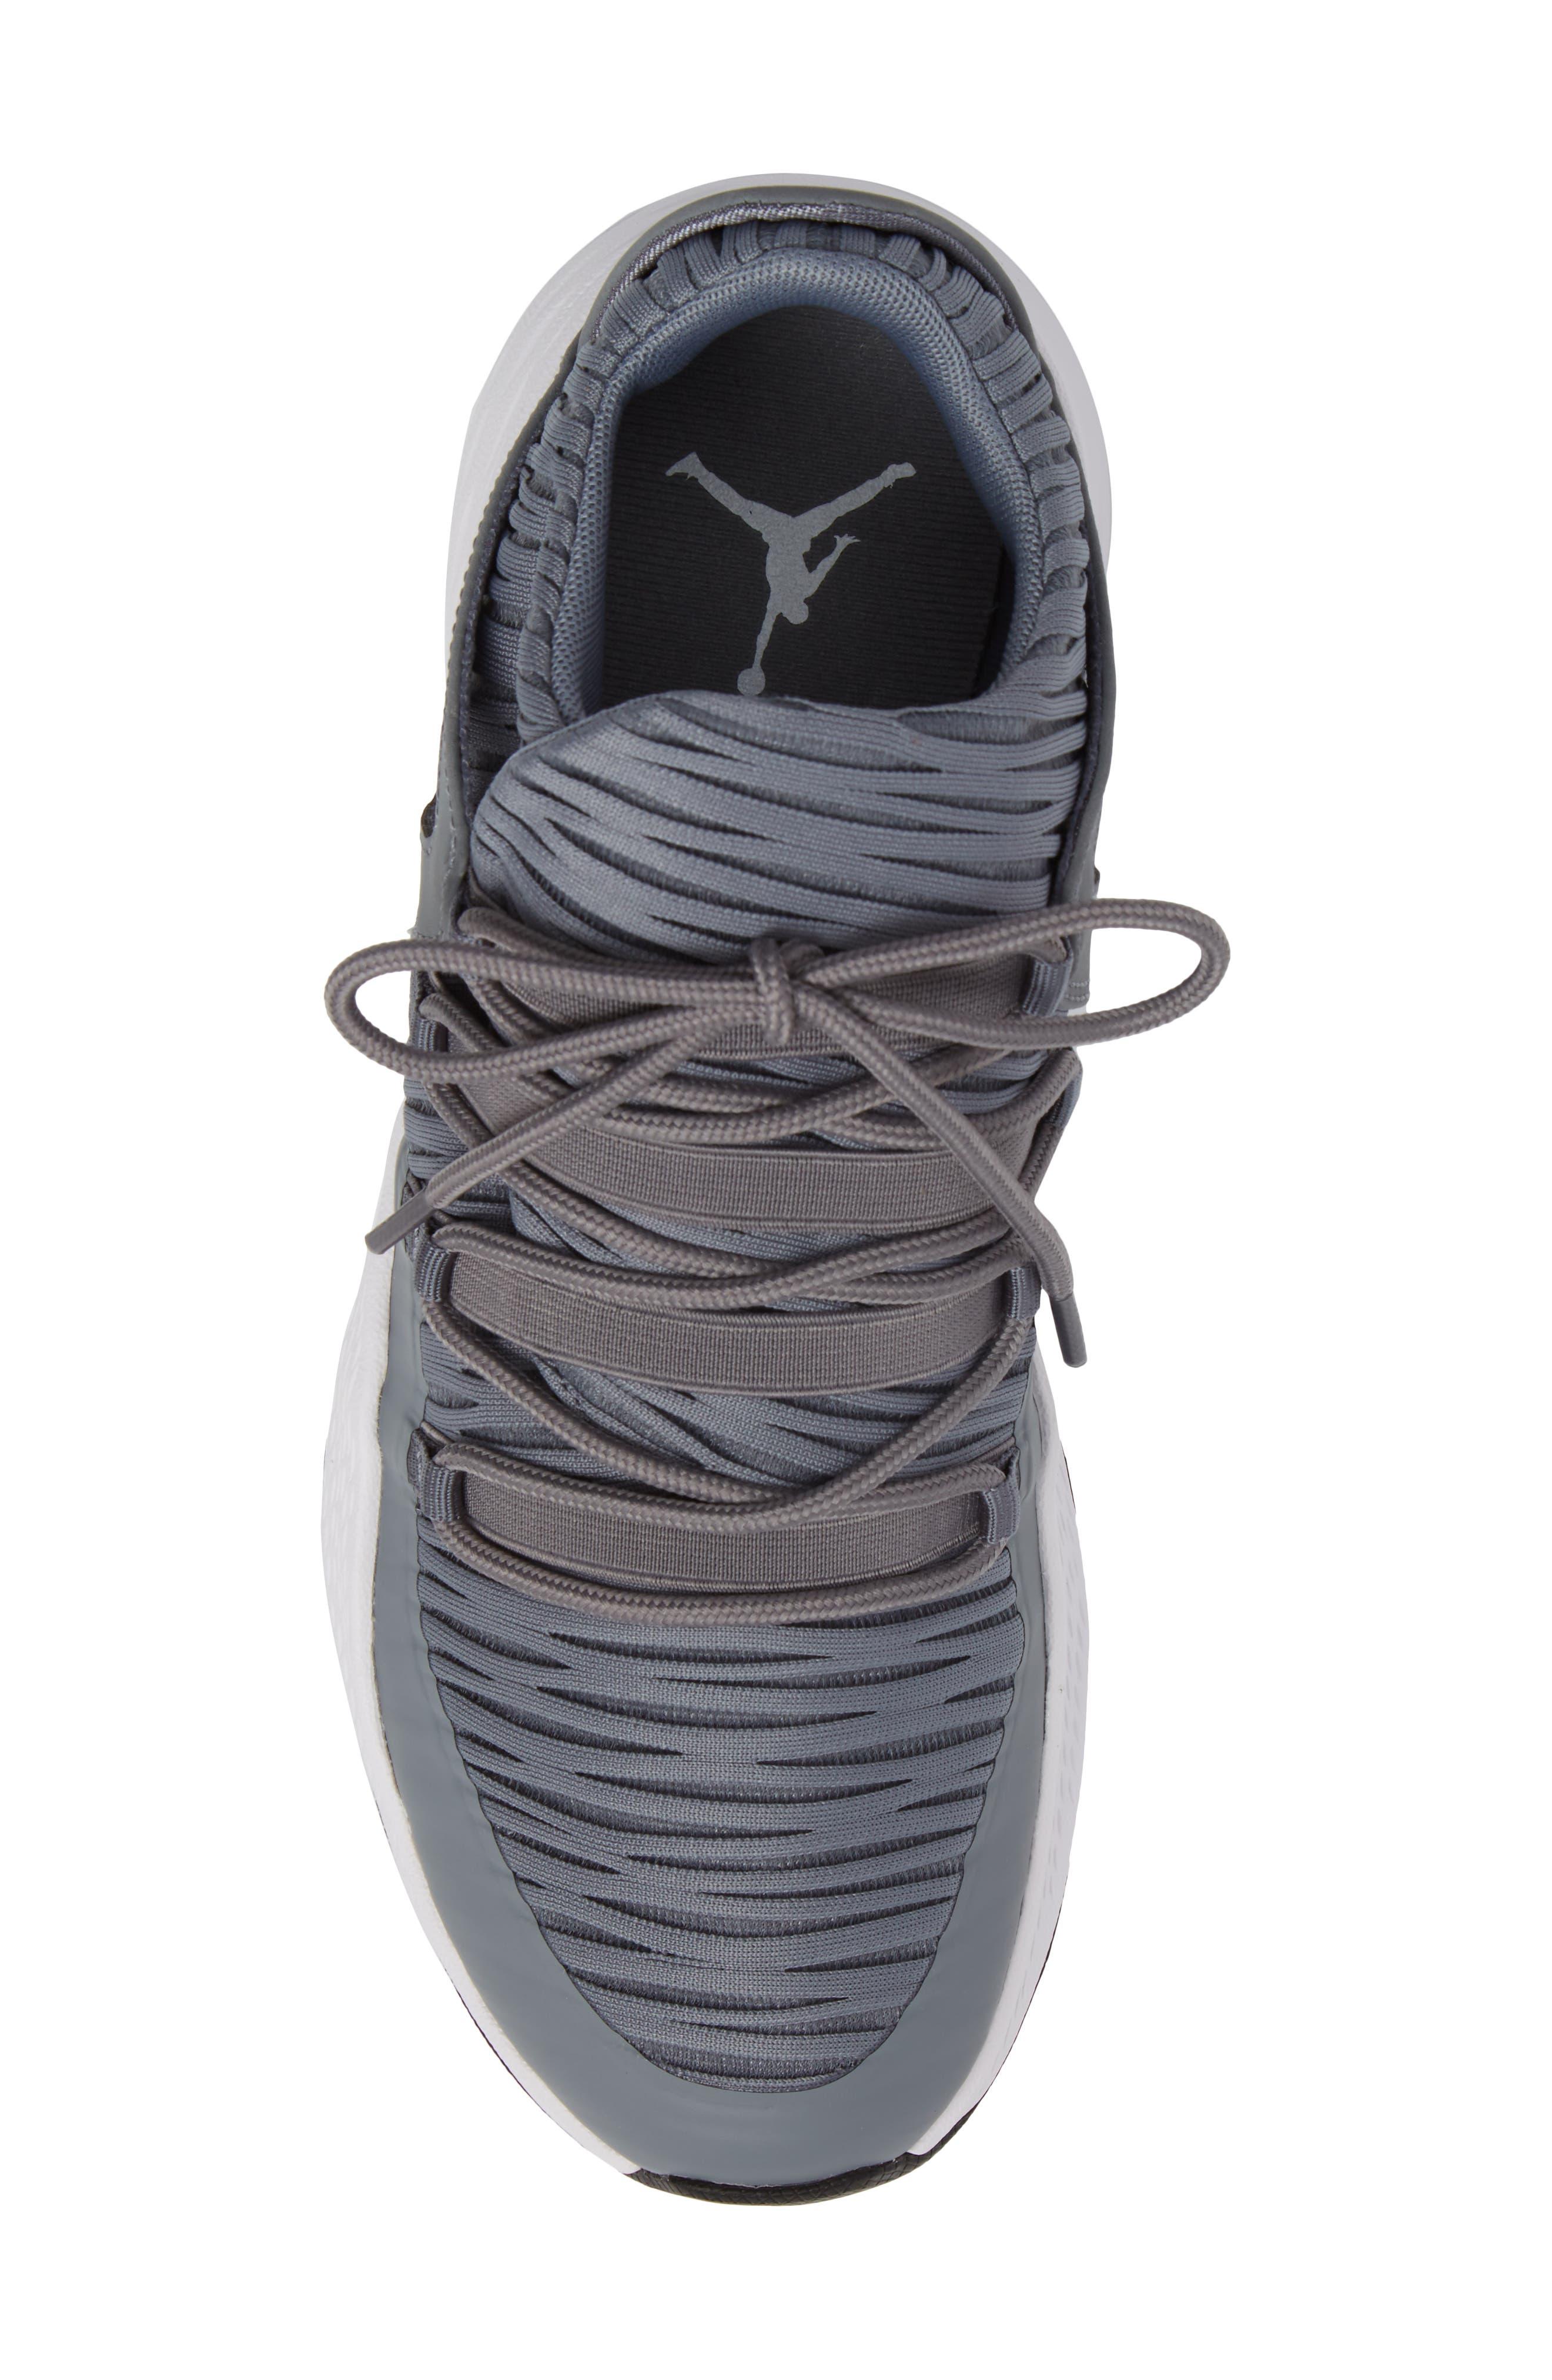 Jordan Formula 23 Low Sneaker,                             Alternate thumbnail 5, color,                             Cool Grey/ White/ Black